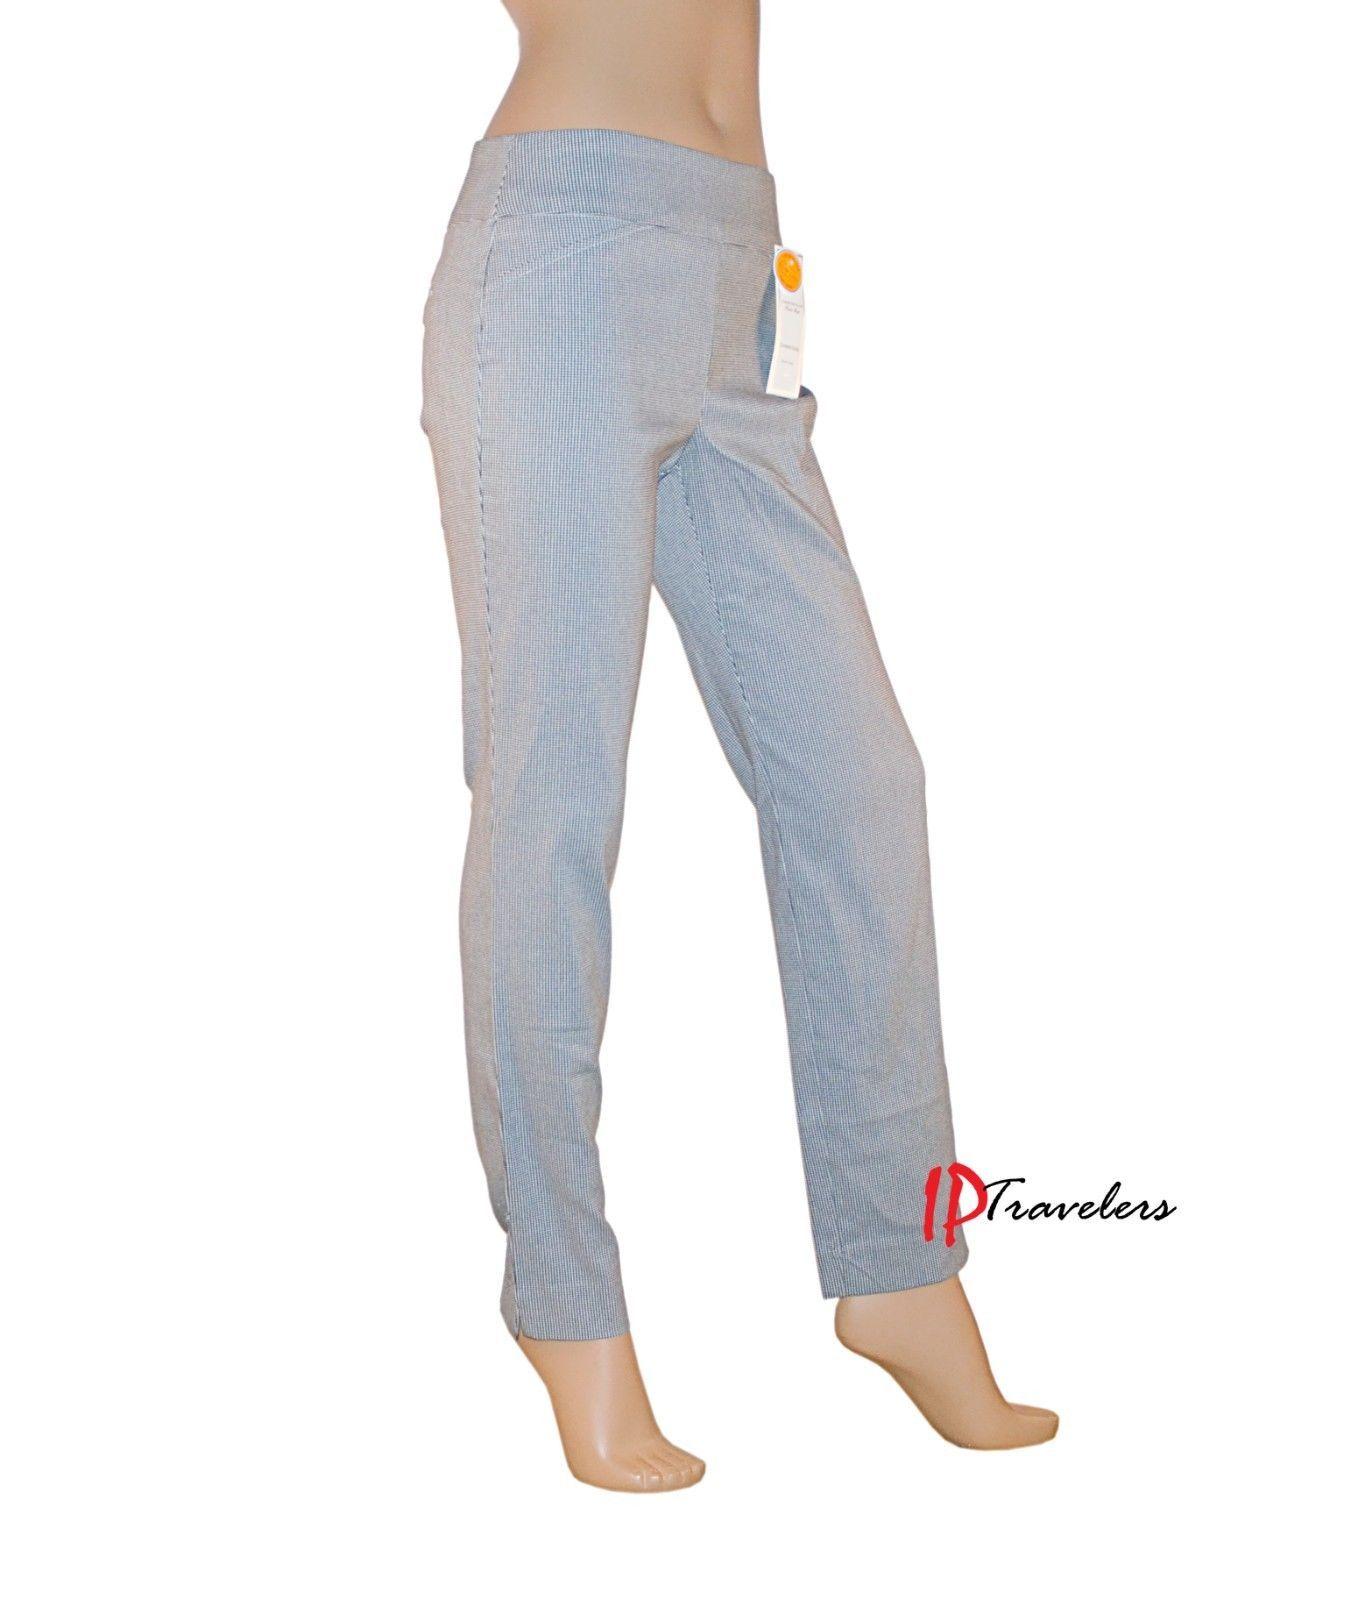 Charter Club Women's Pants Black and White Slim Leg Waist Smoothing $69.50